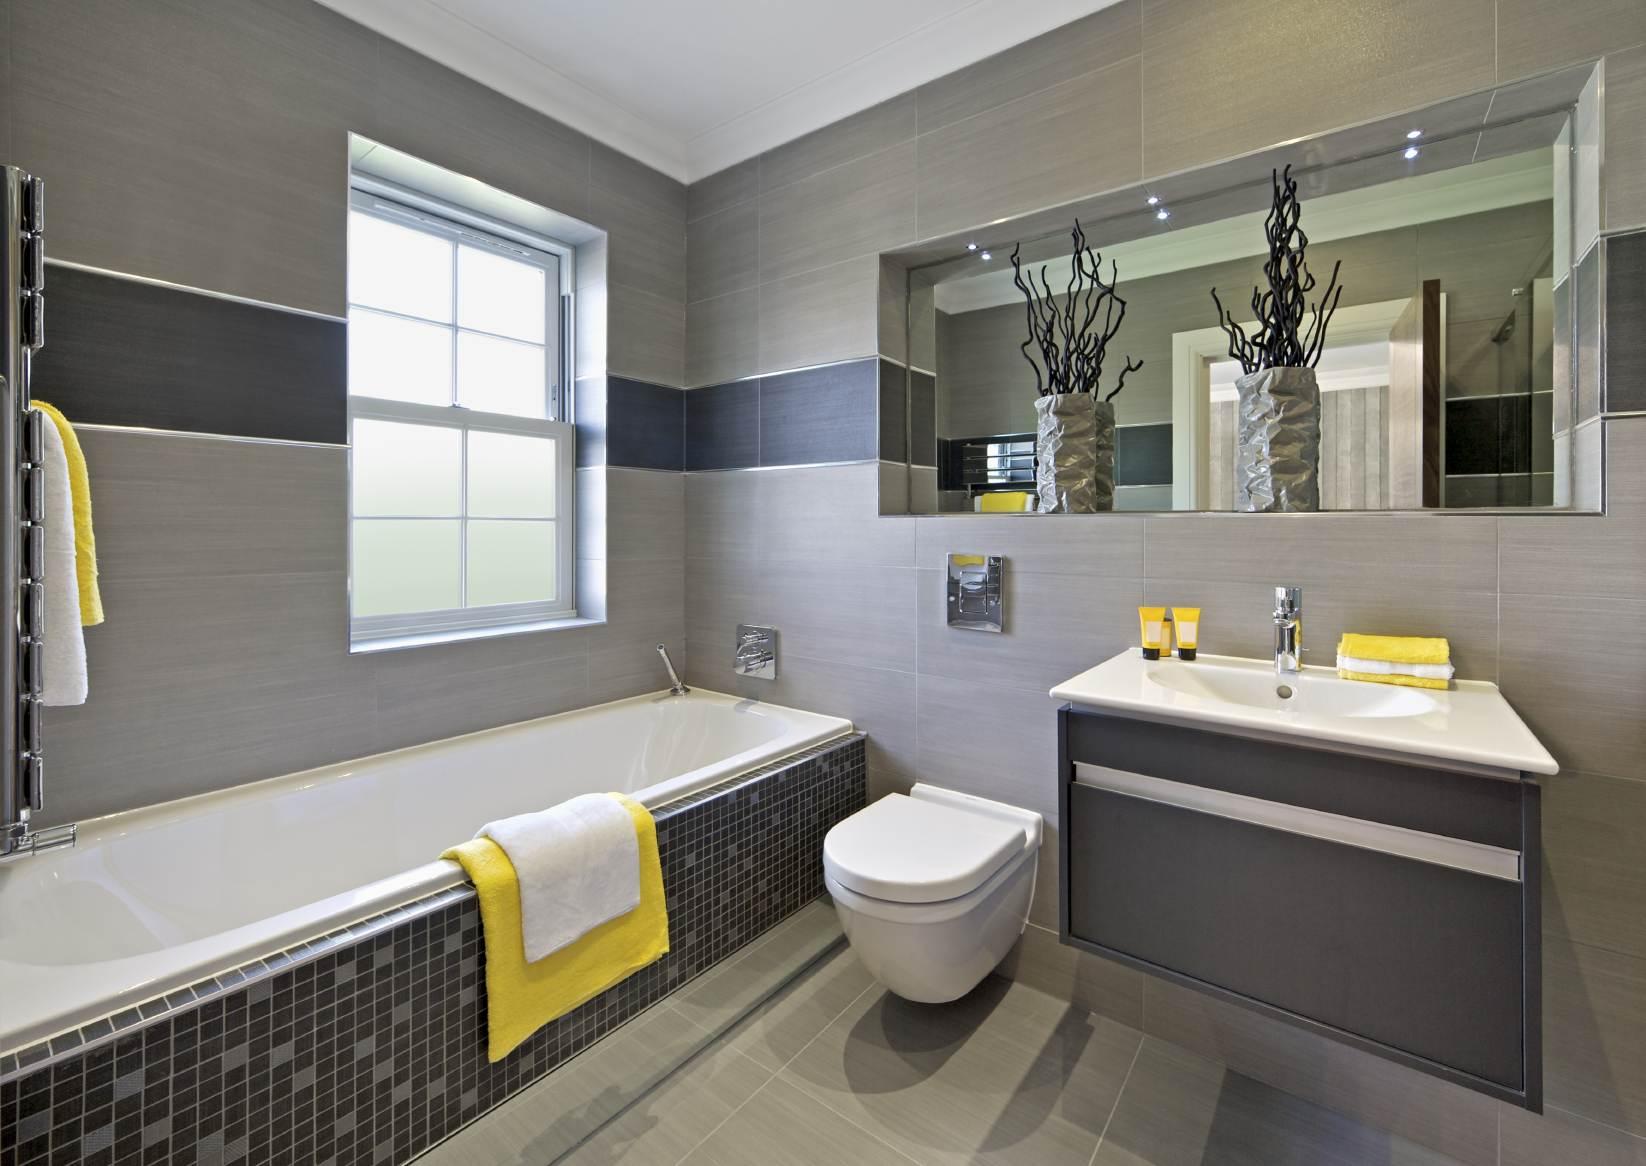 Salle de bains aide au choix budget type infos for Organiser sa salle de bain